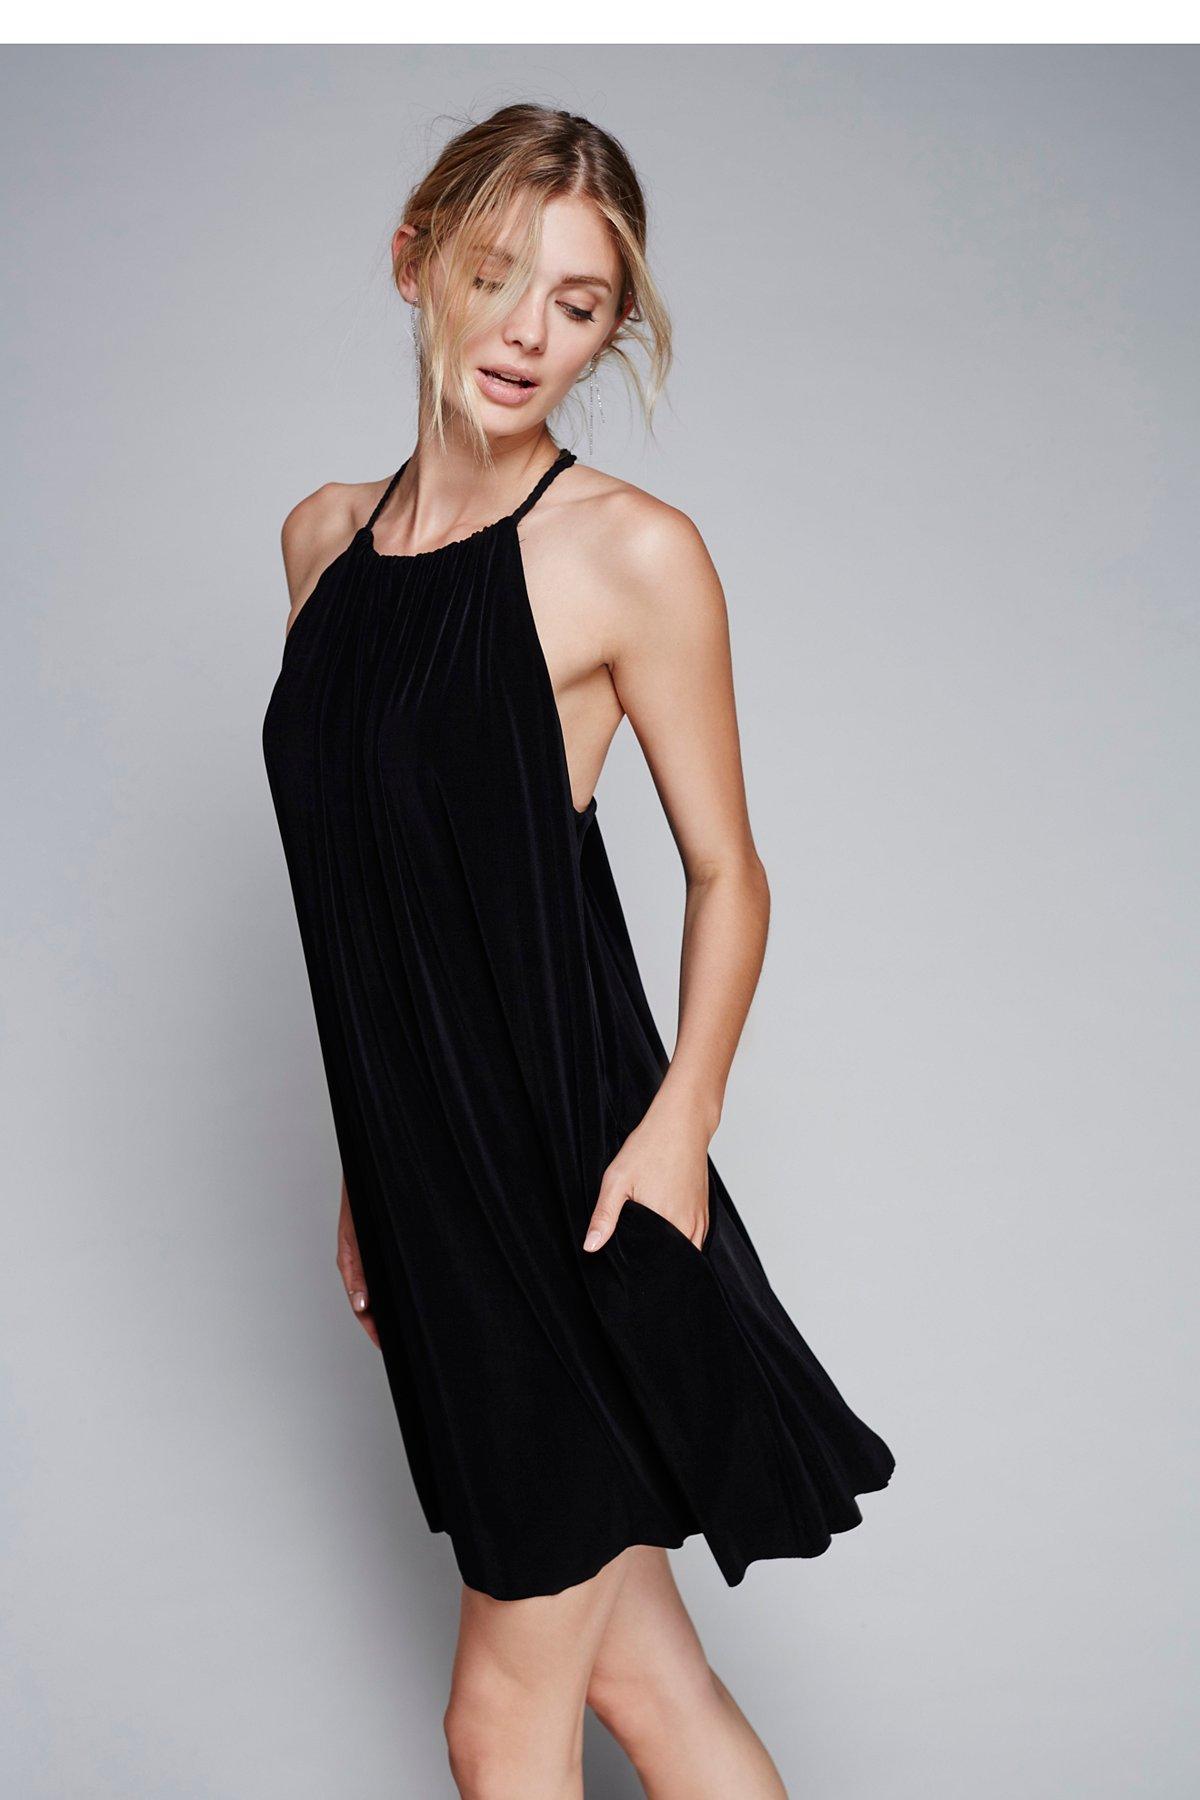 The Chic Mini Dress